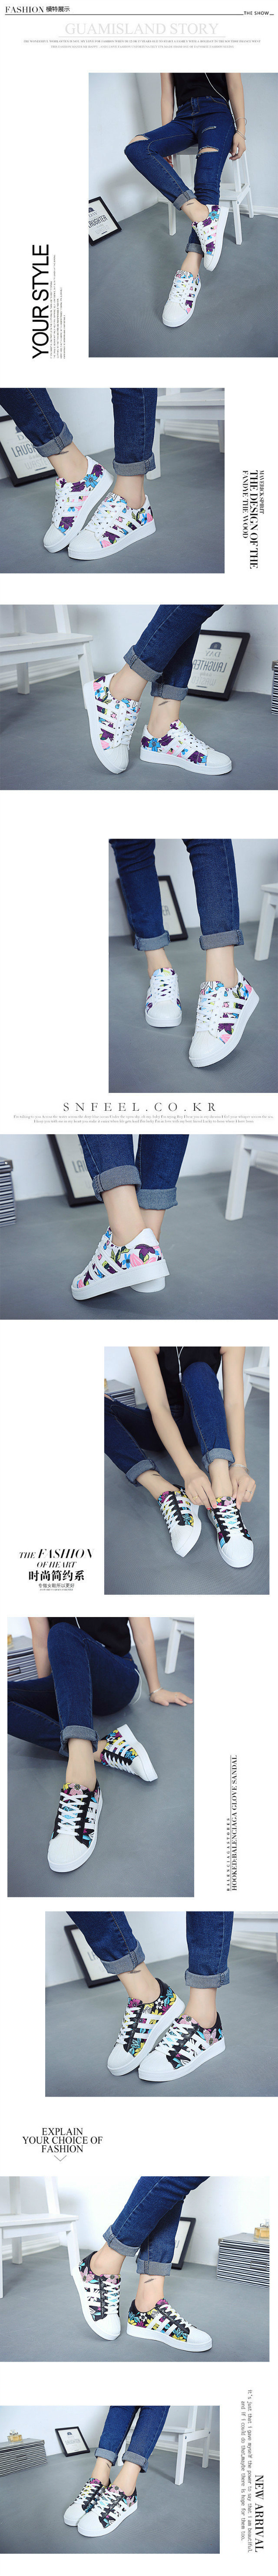 5df058238a79 New style autumn woman casual platform female korean girl shoes ...